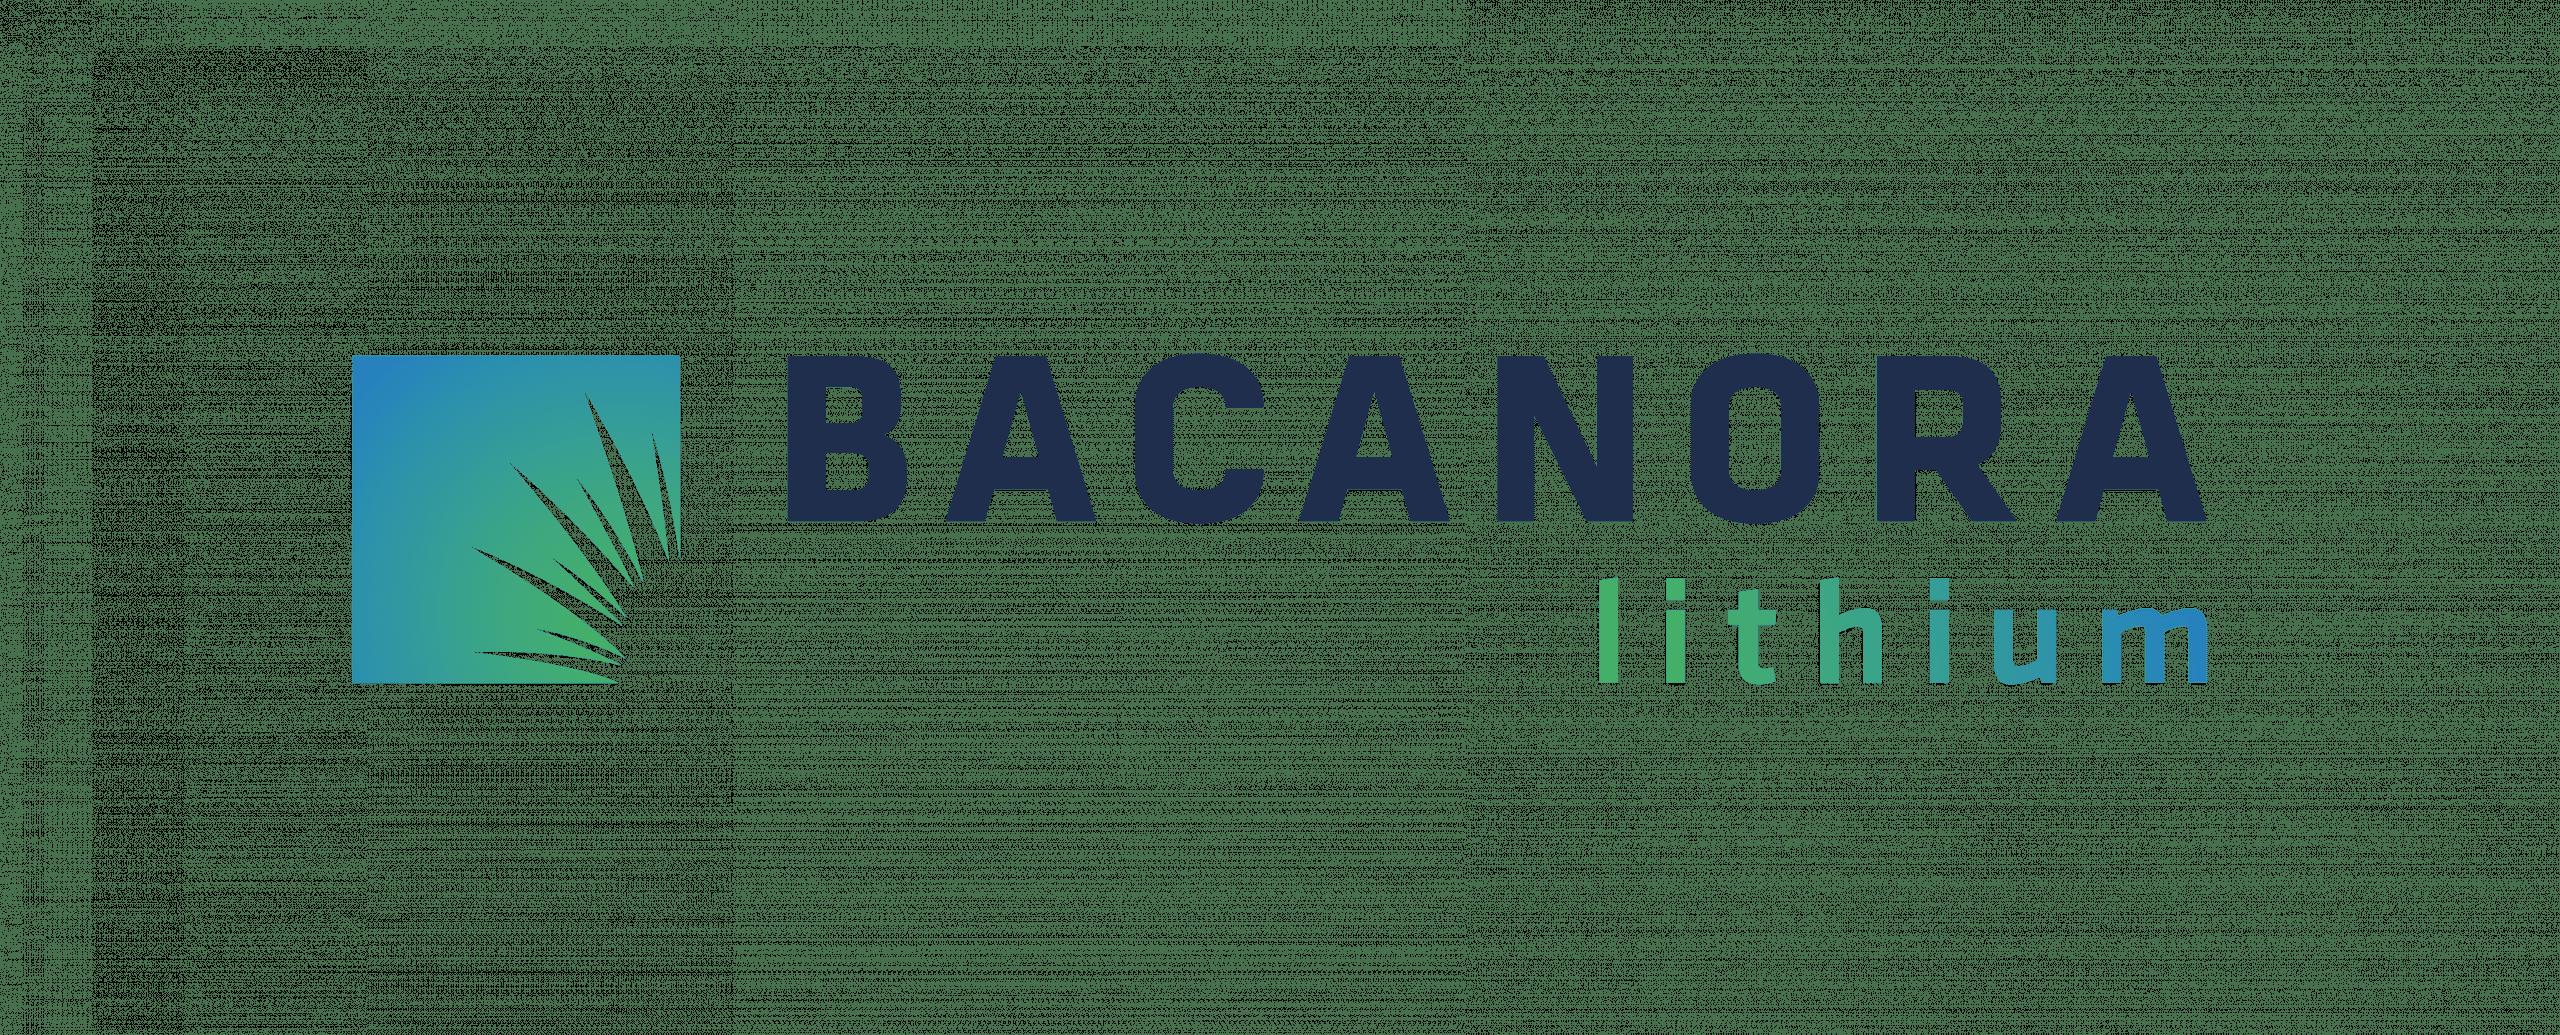 bacanora logo